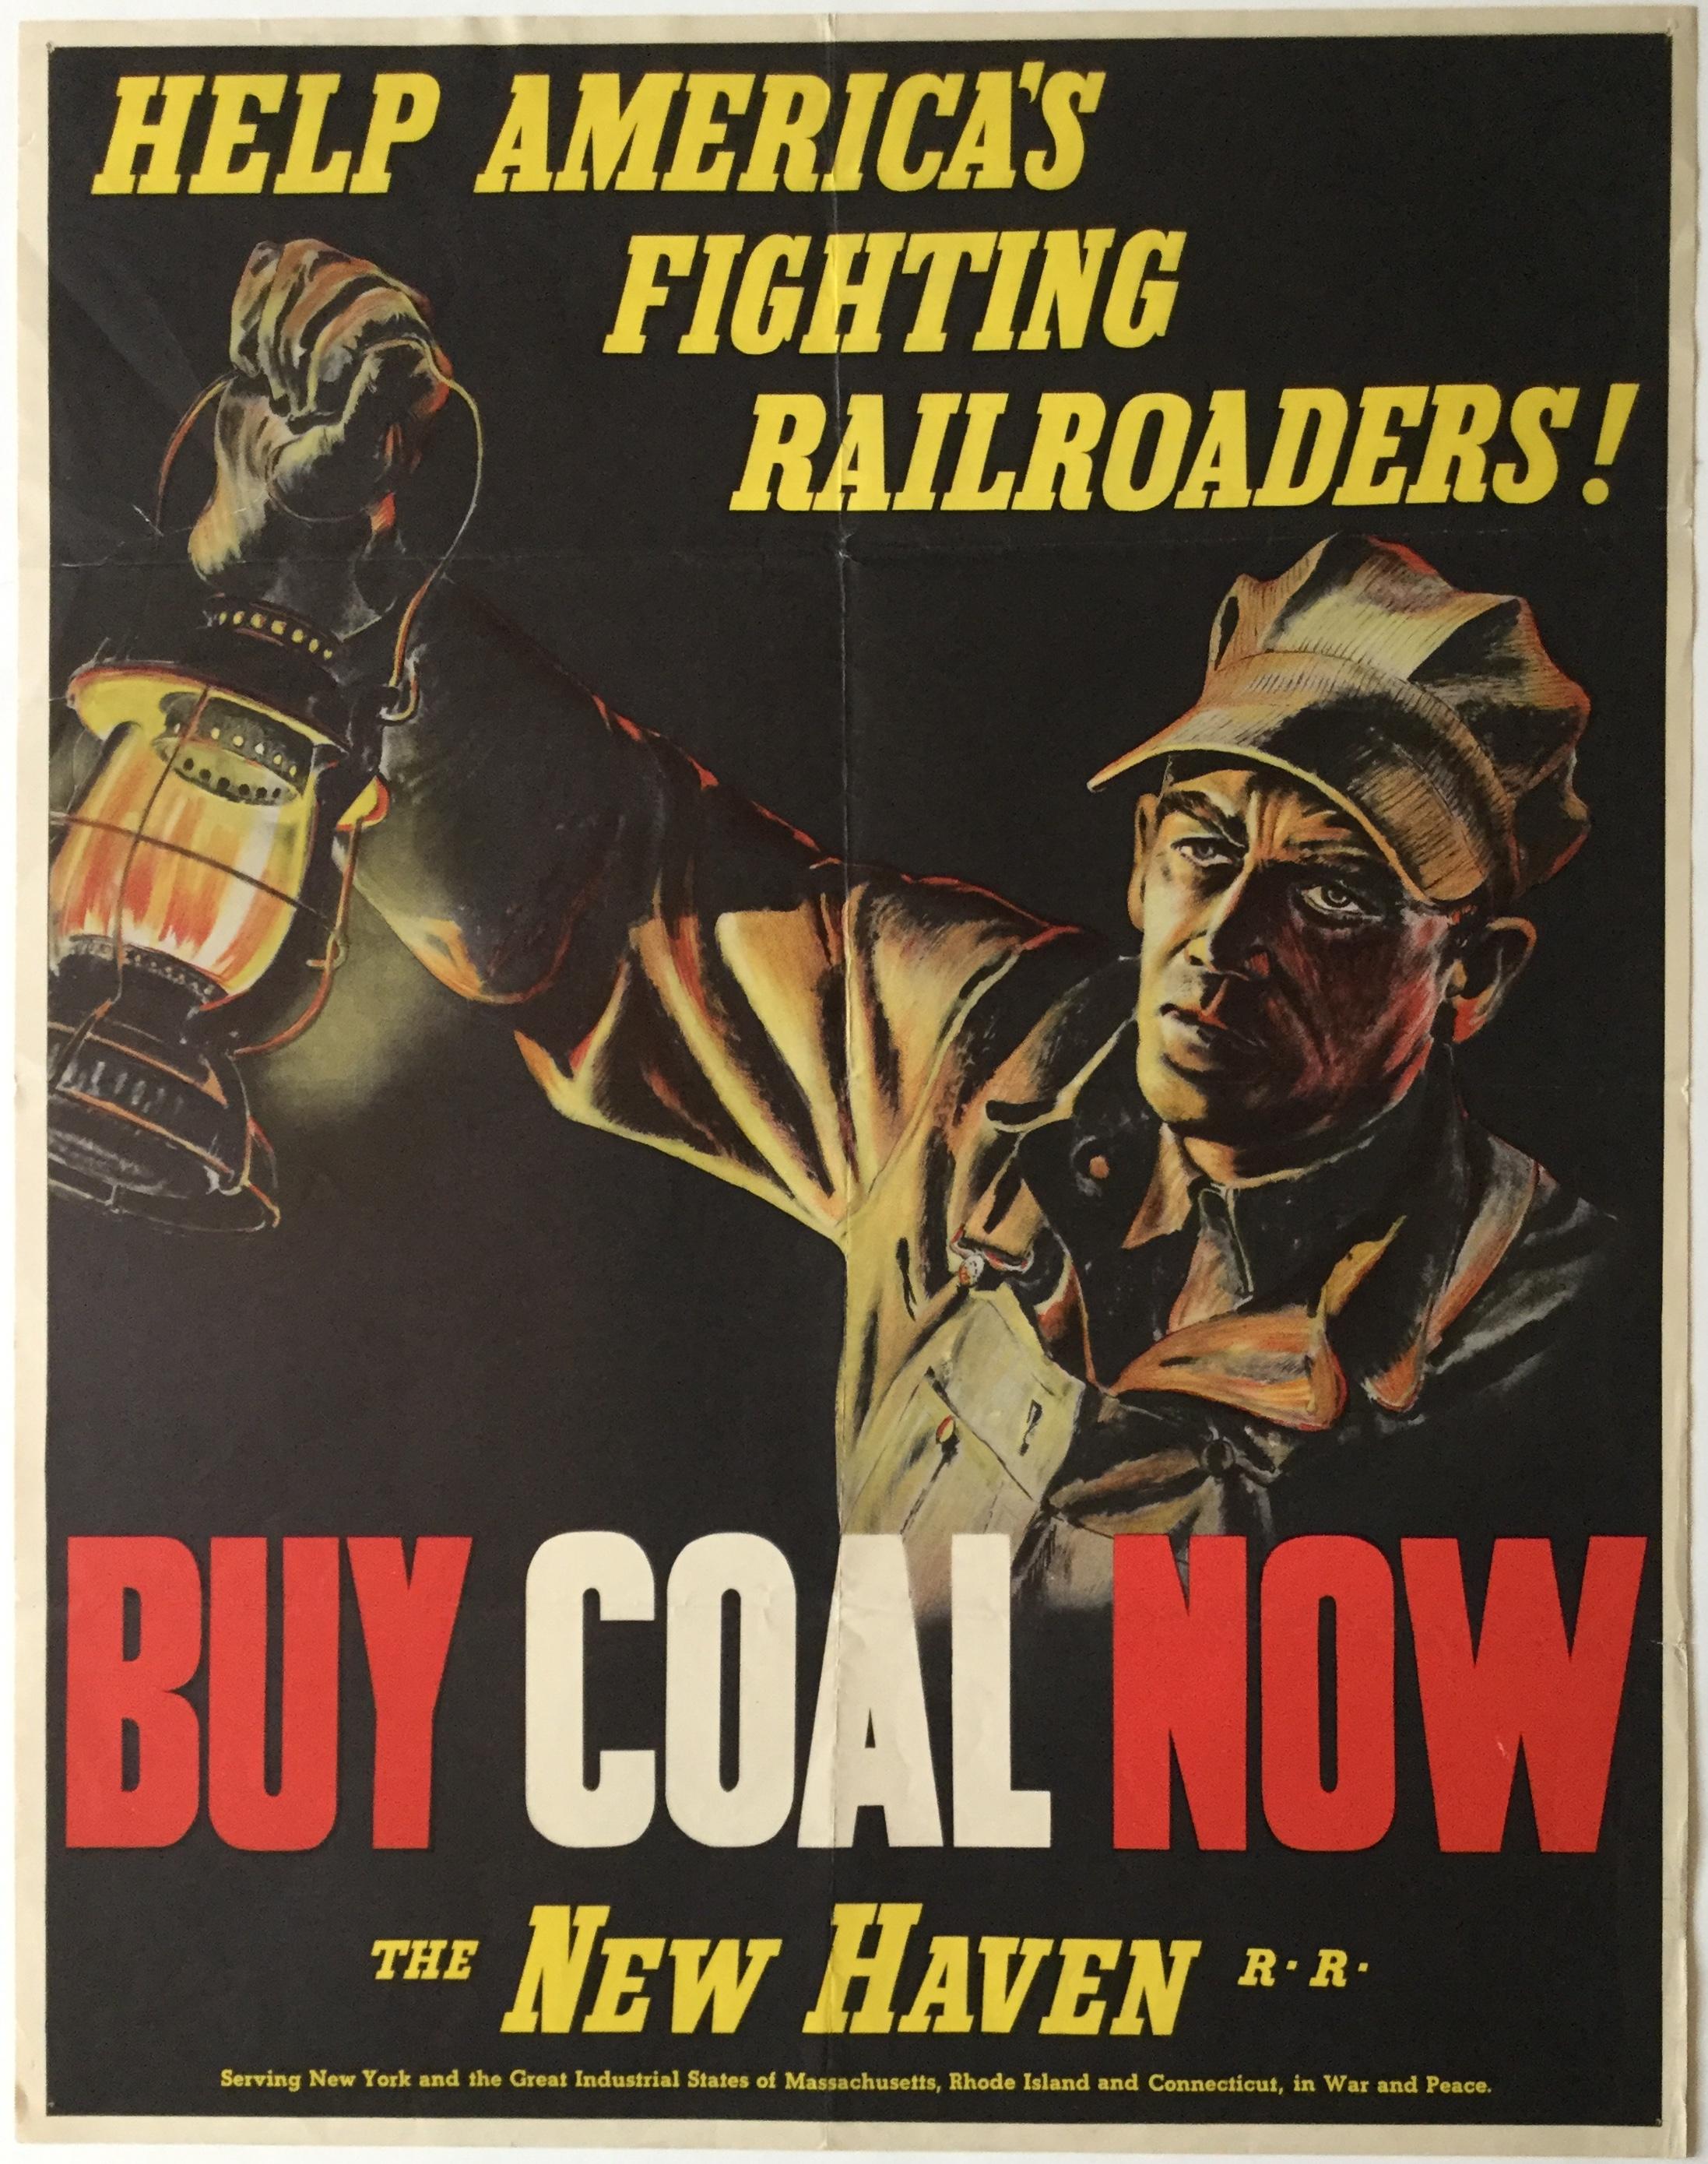 PB2406 HELP AMERICA'S FIGHTING RAILROADERS! BUY COAL NOW - NEW HAVEN RAILWAY